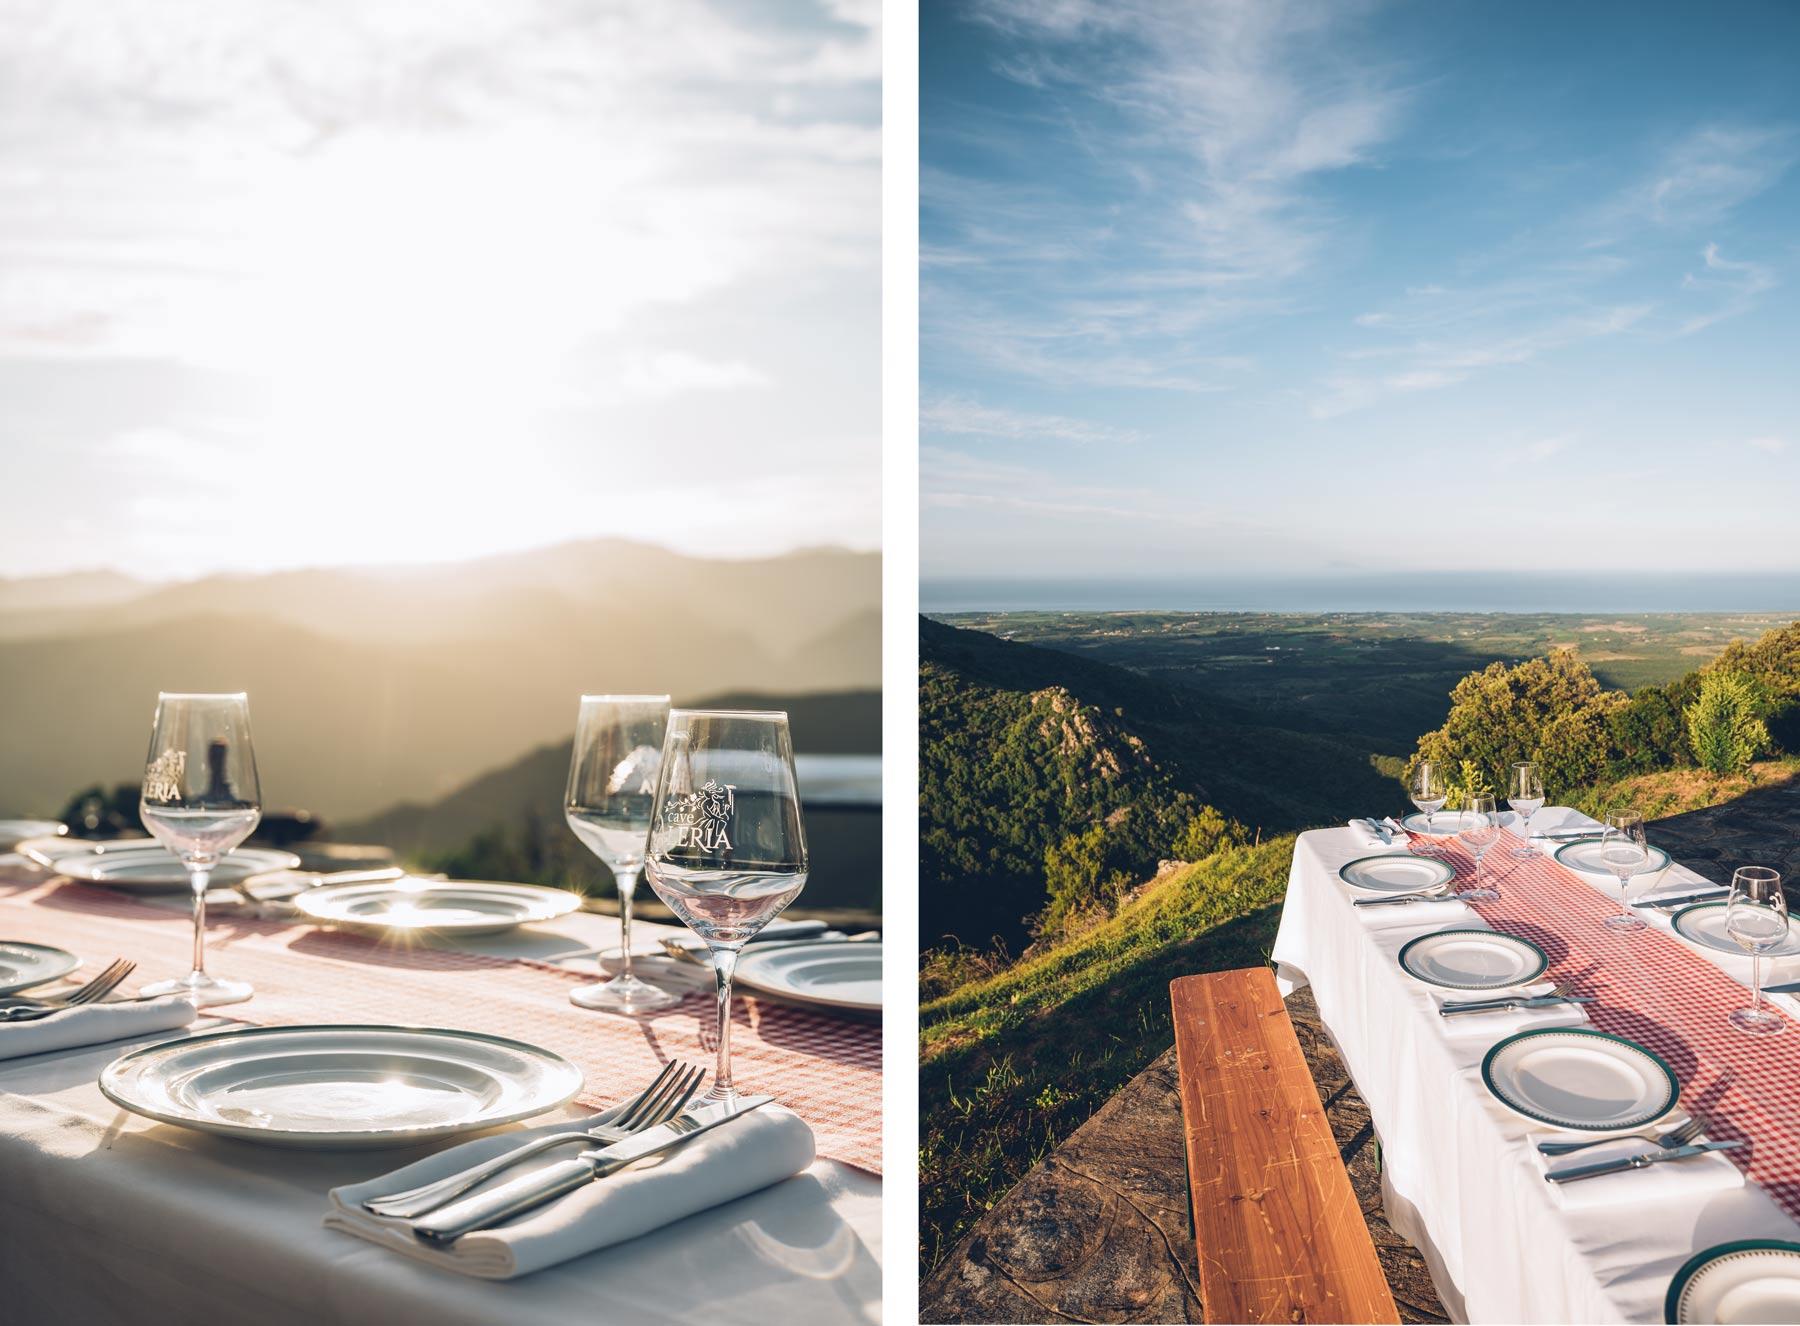 Pique Nique de rêve en Corse